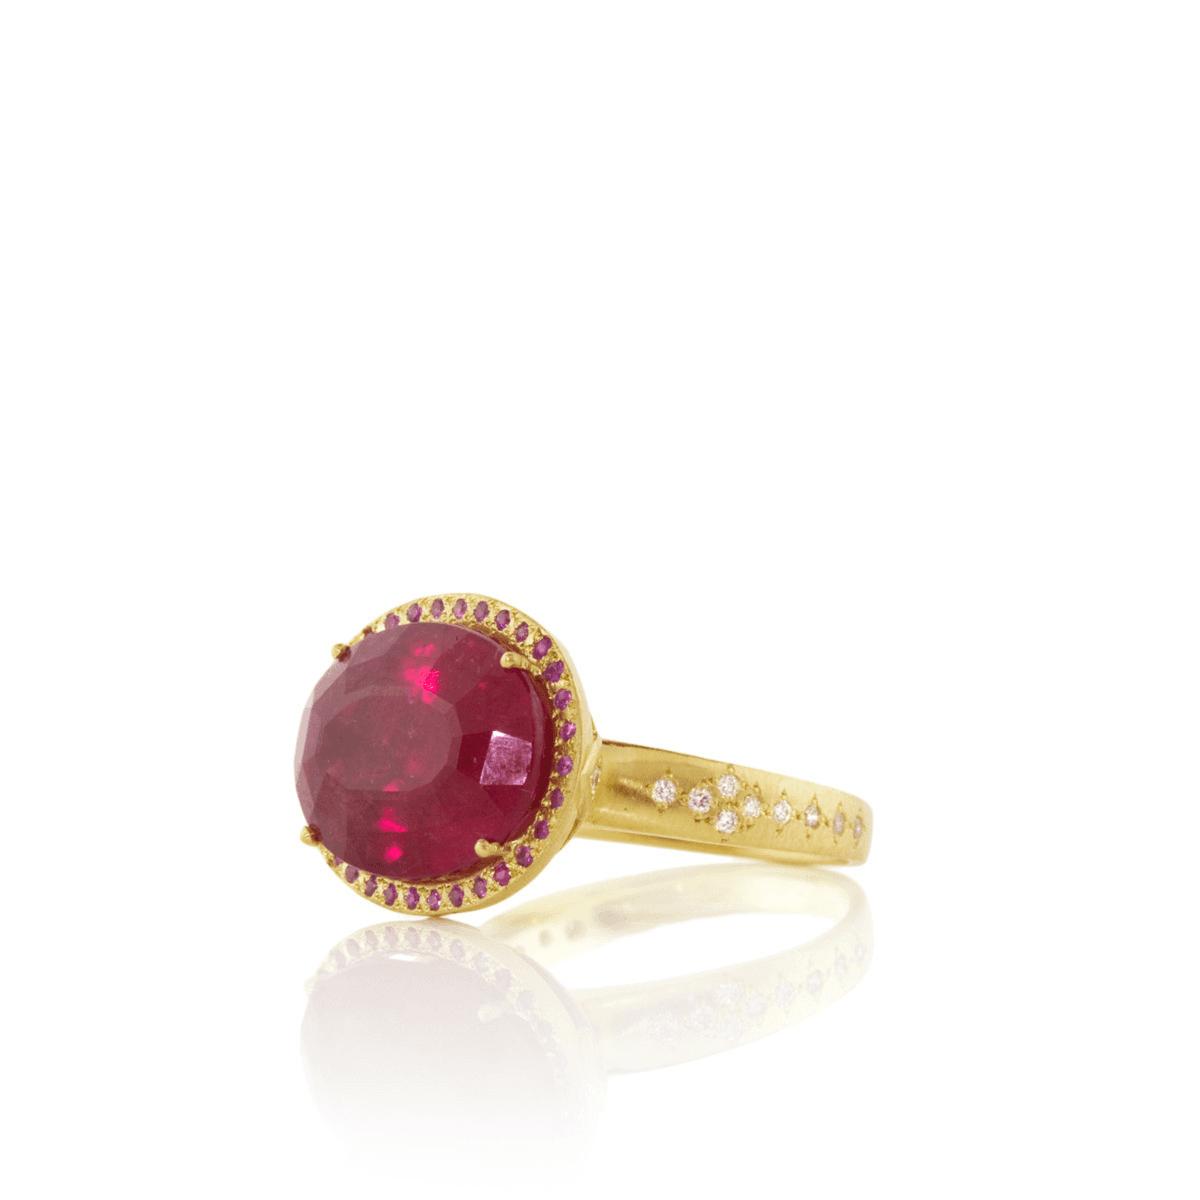 Rubellite Ring - Adel Chefridi - Mansoor Jewelers